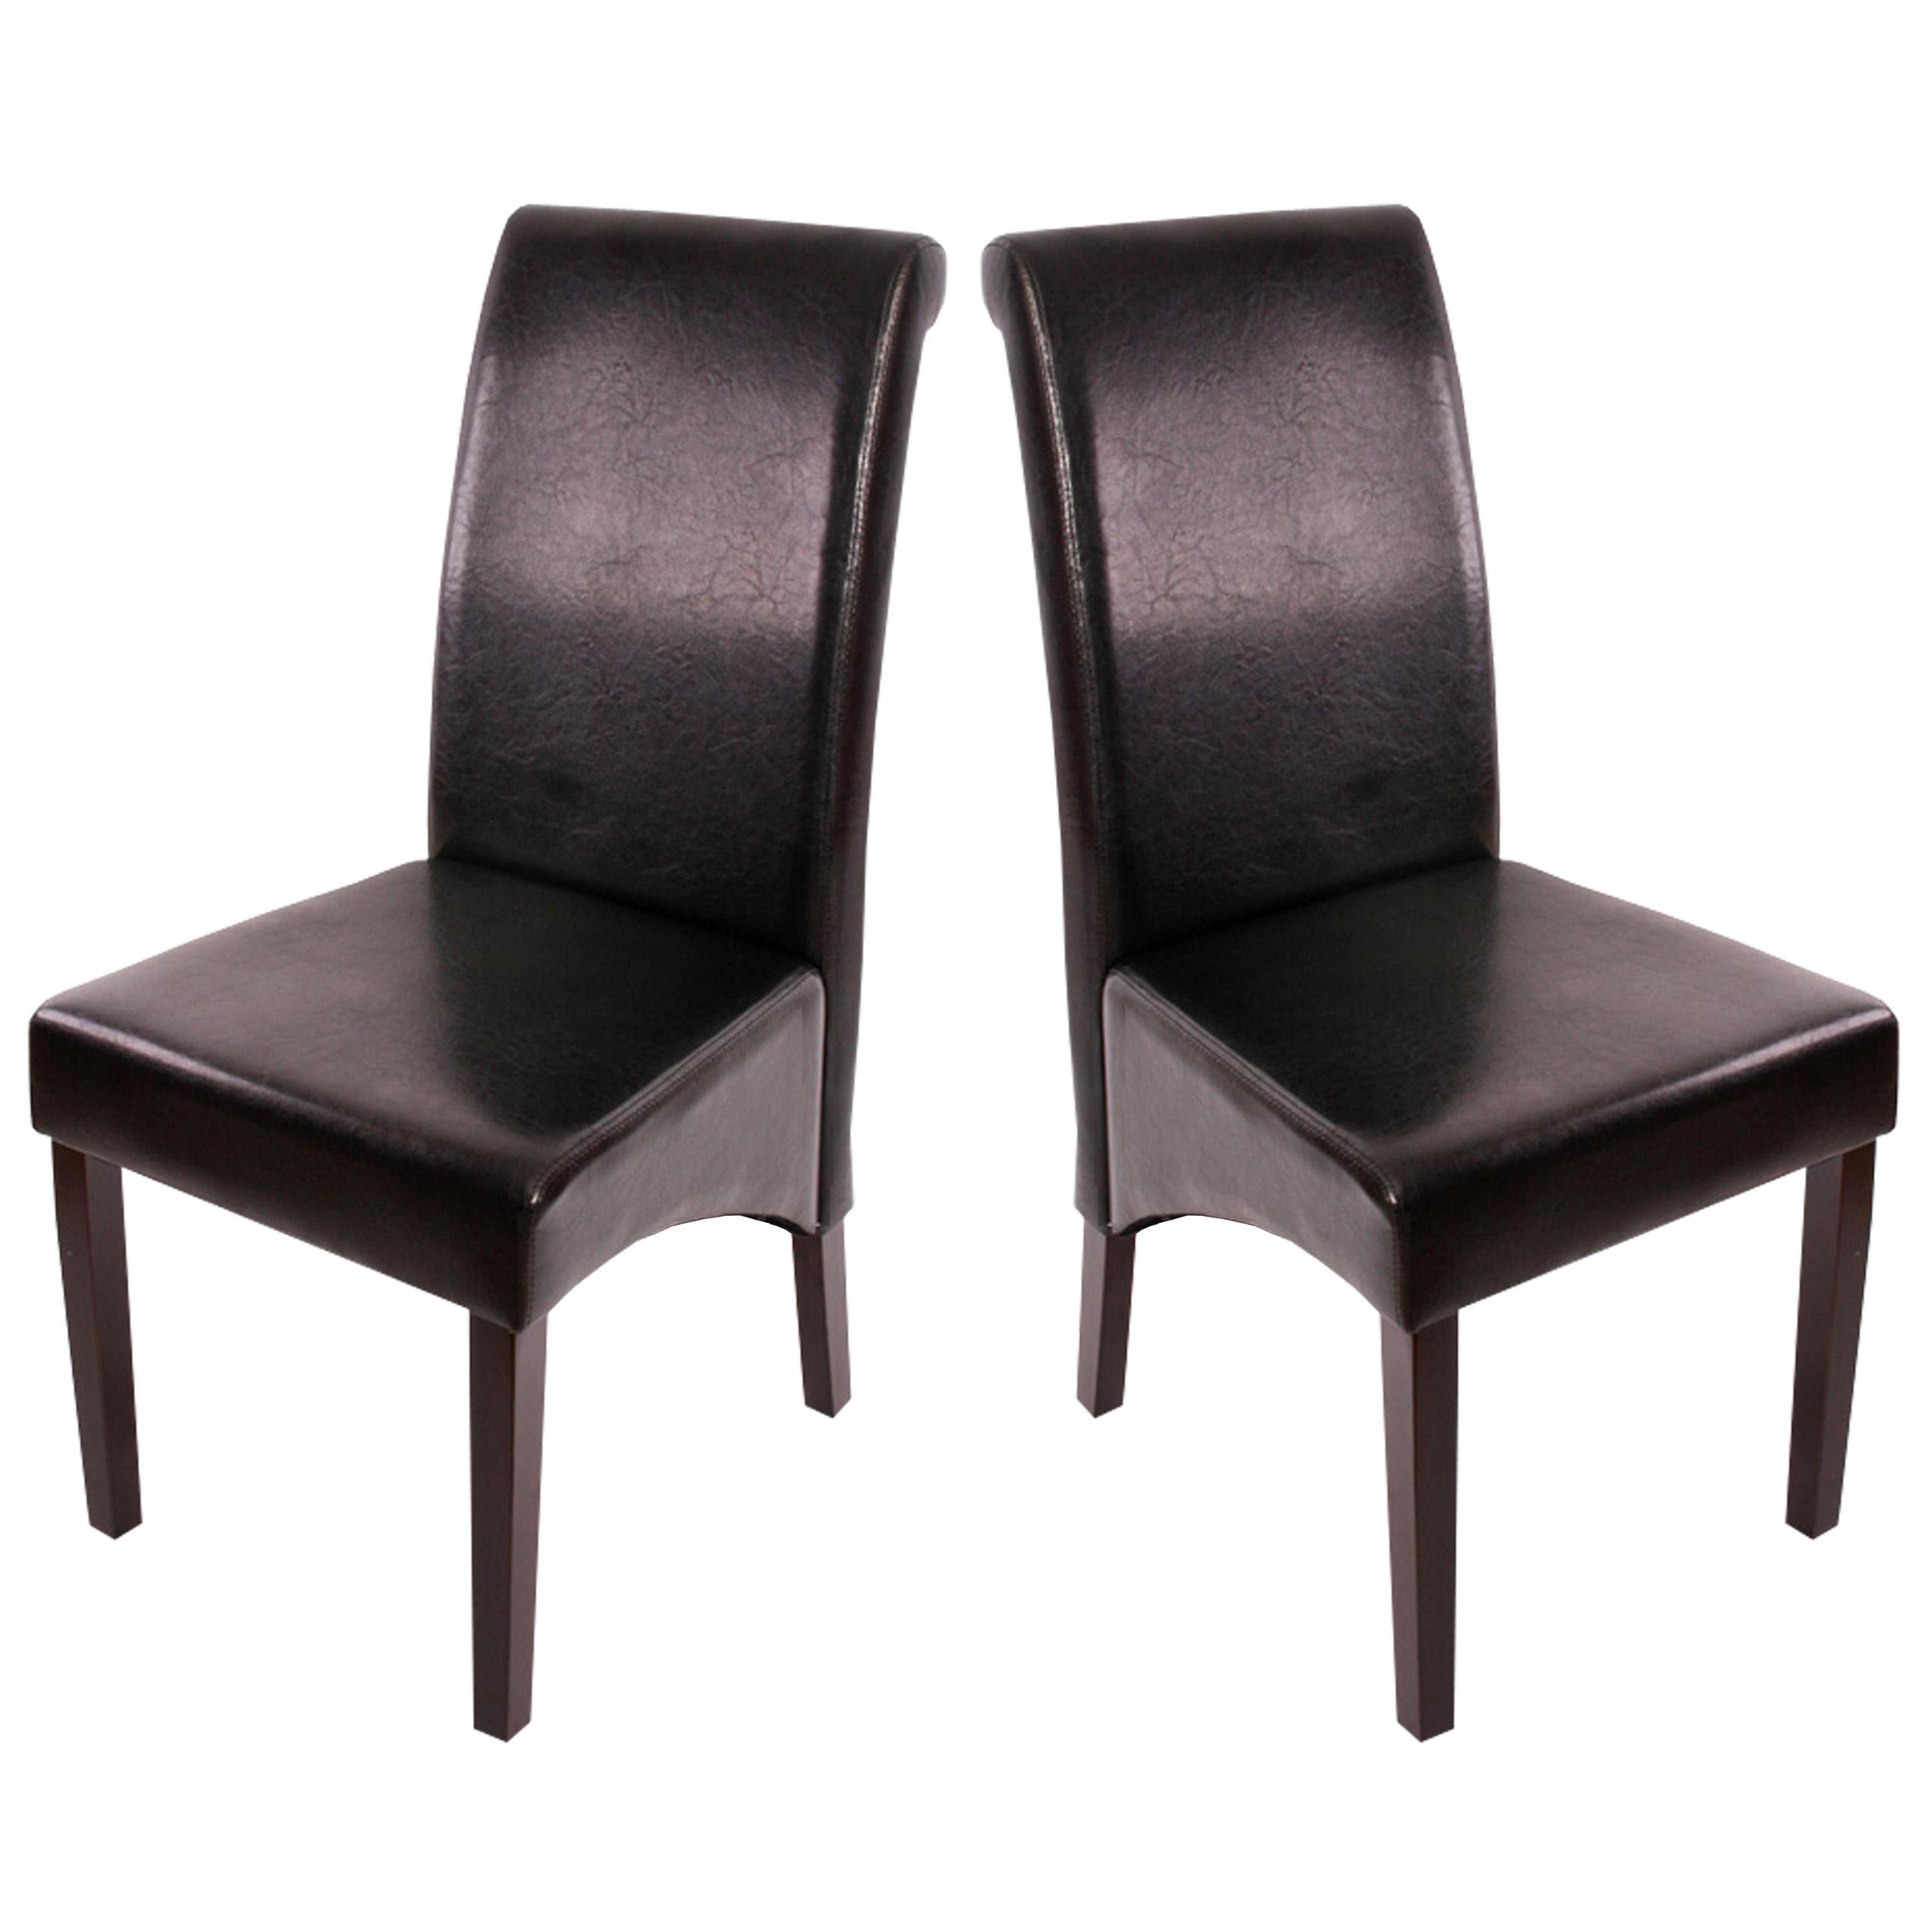 2x Barhocker Barstuhl Brescia schwarz Leder dunkle Beine